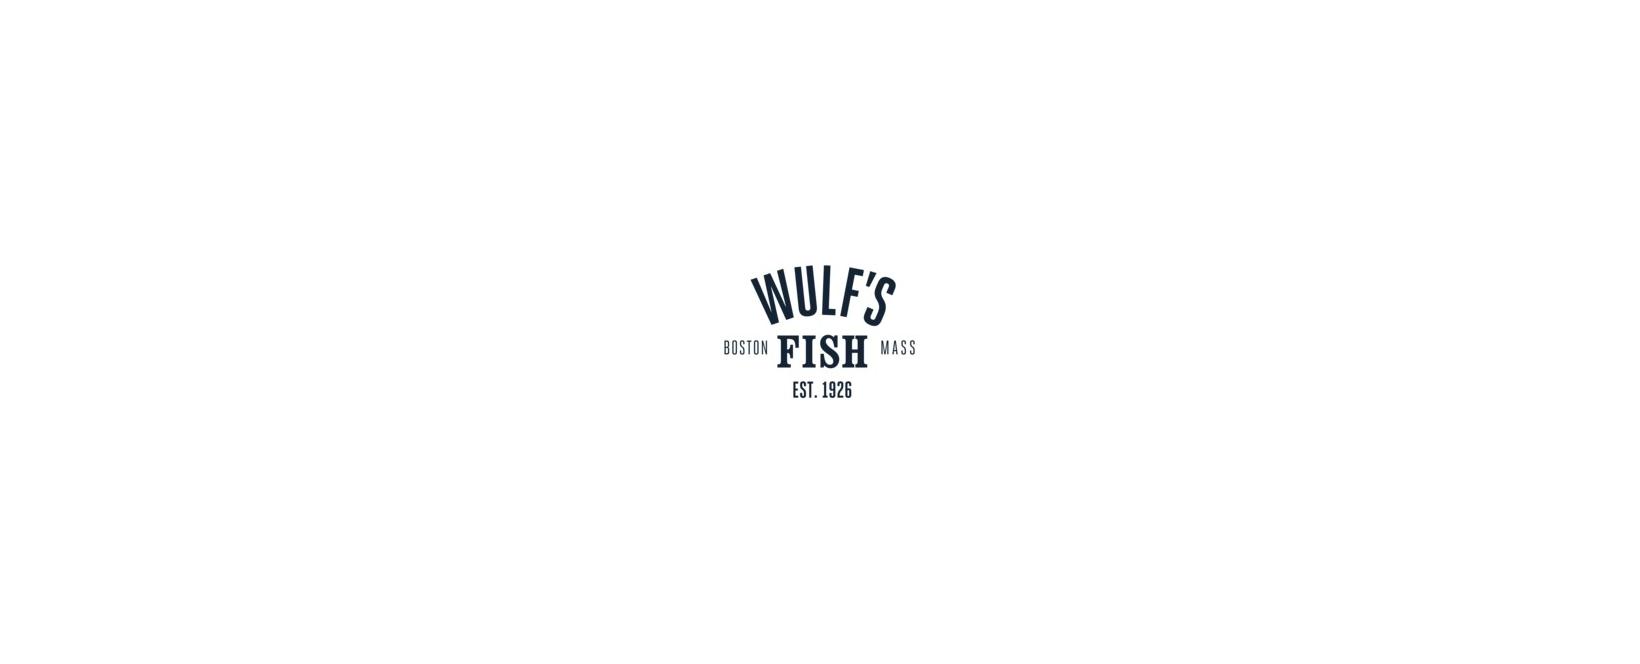 Wulf's Fish Coupon Code 2021